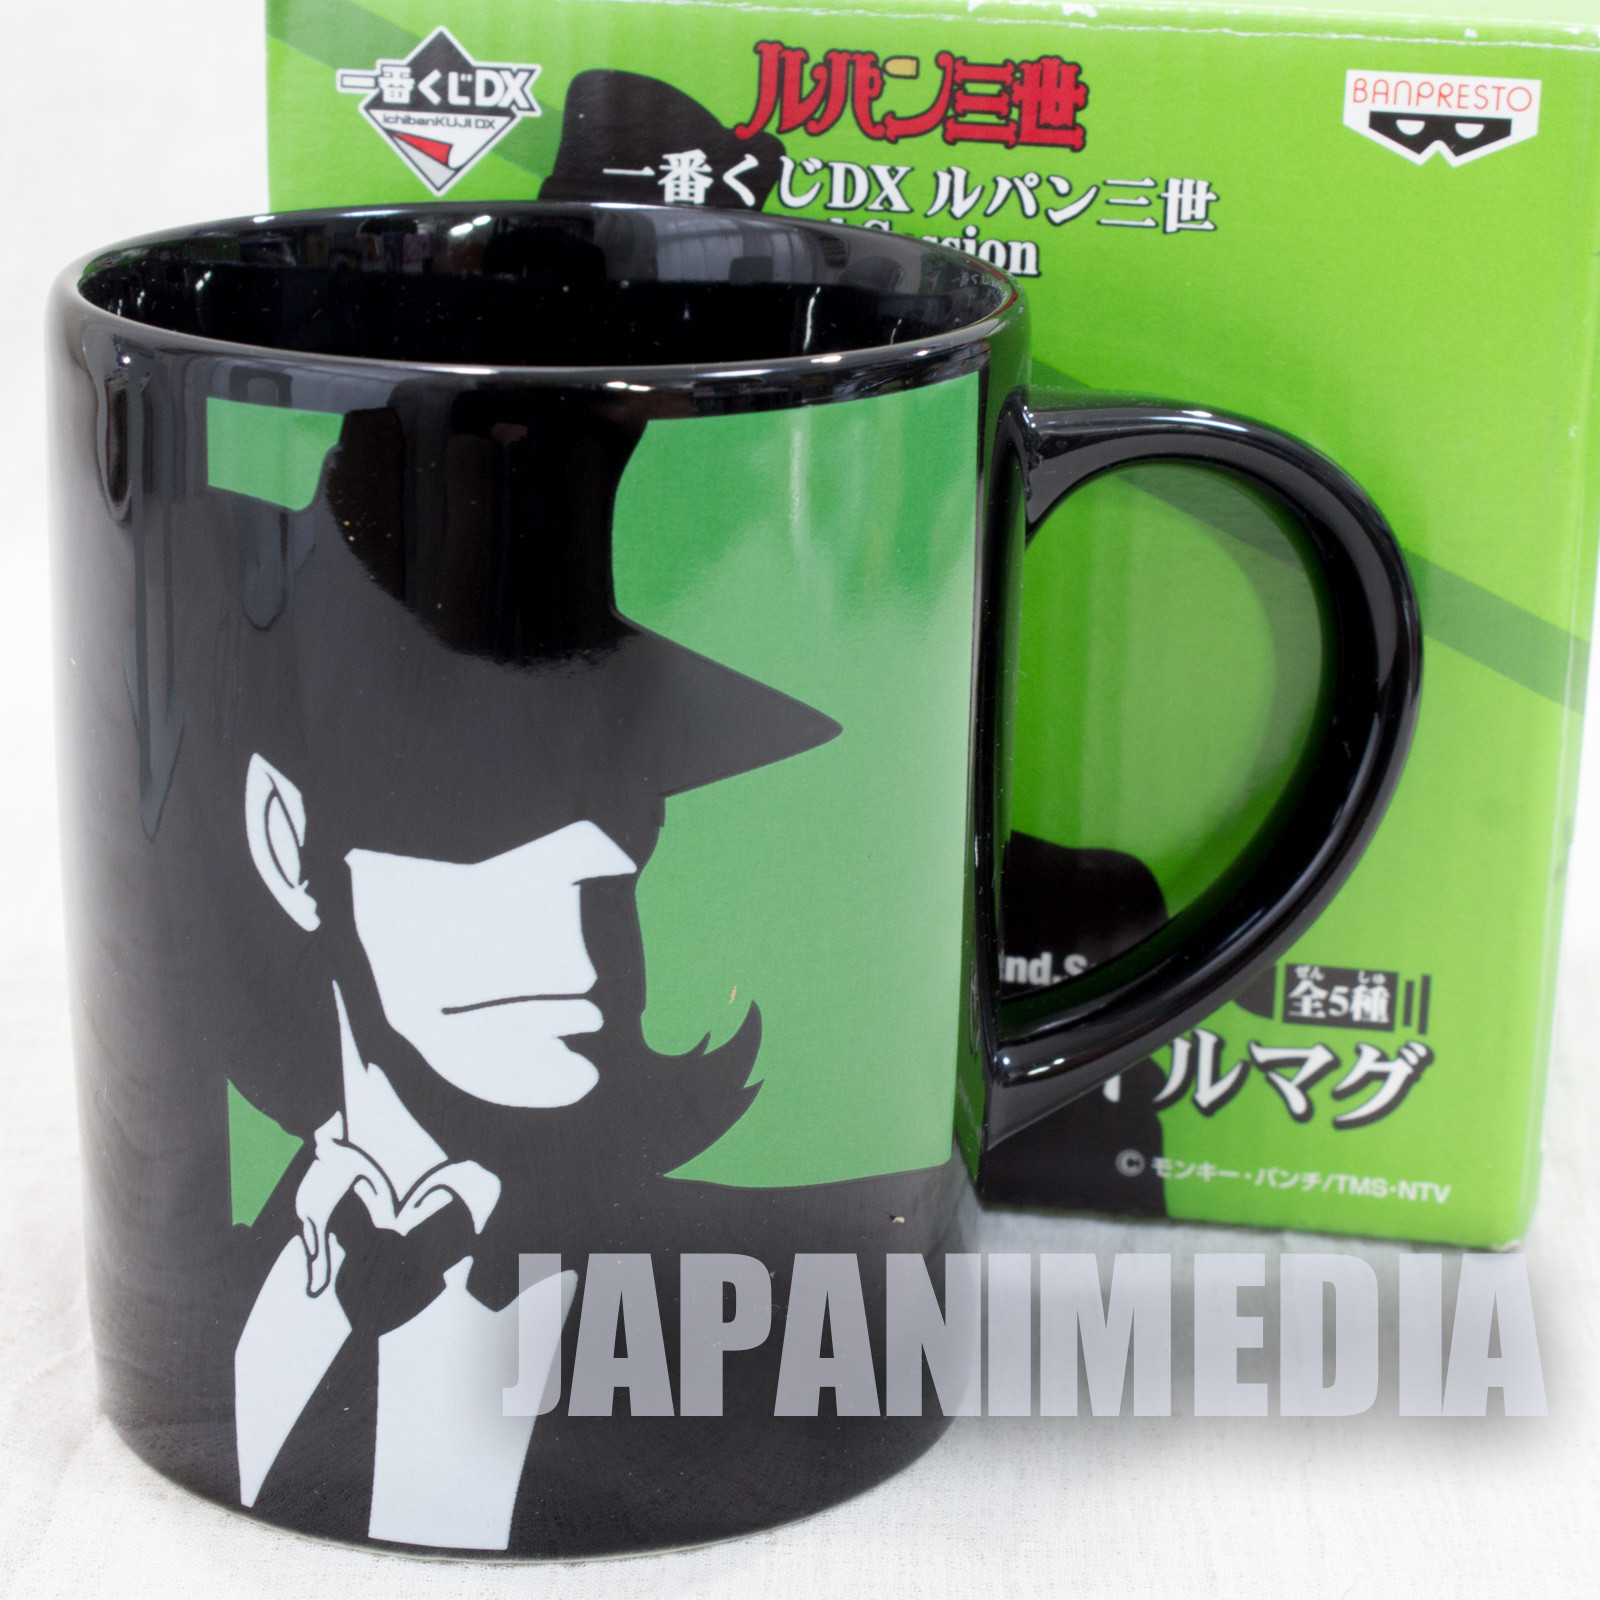 Lupin the Third (3rd) Daisuke Jigen Cool style Mug JAPAN ANIME MANGA